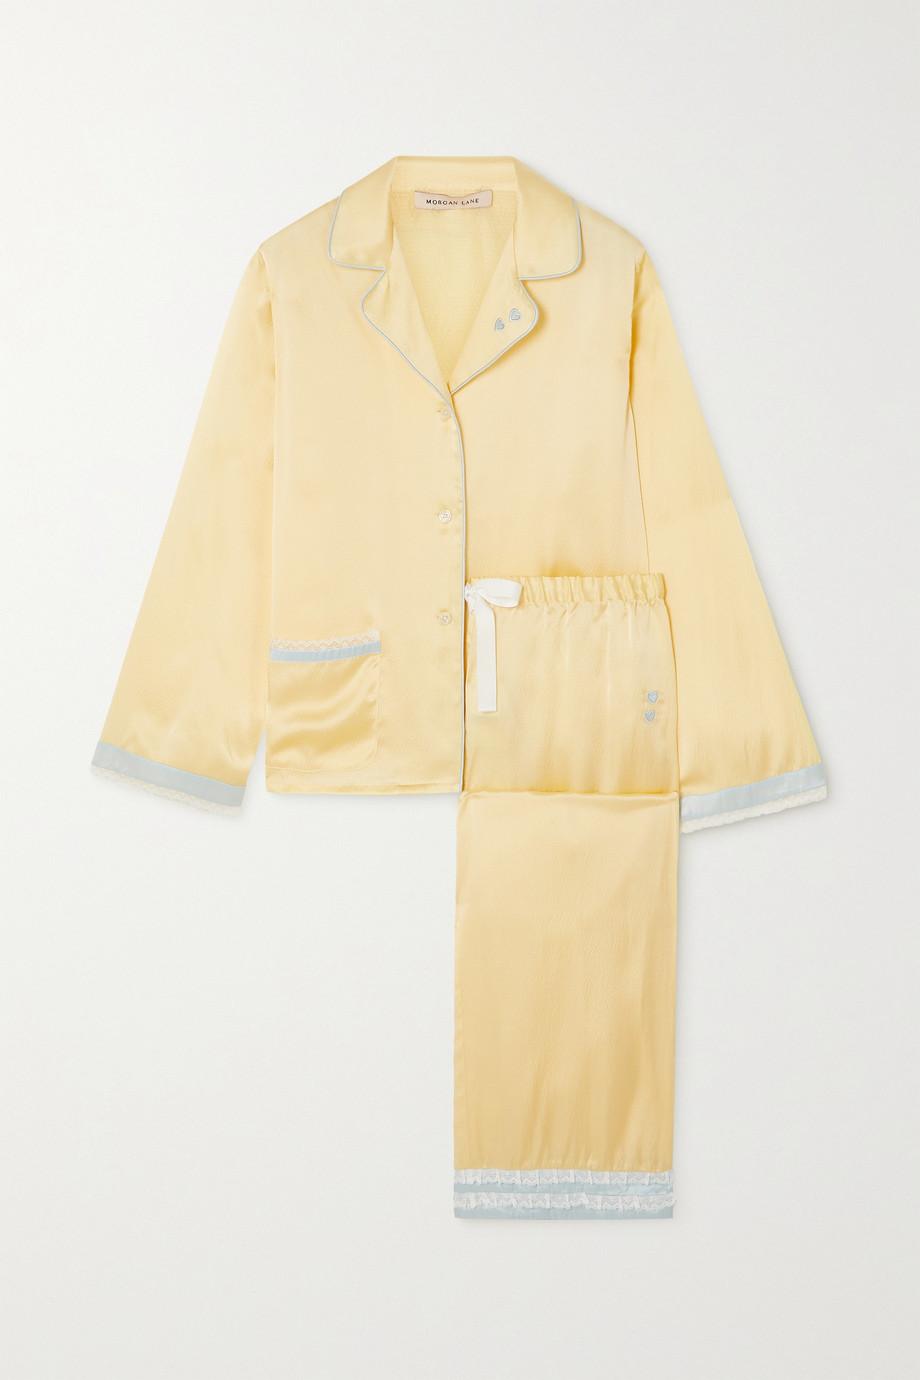 Morgan Lane Jane and Faye lace-trimmed hammered silk-charmeuse pajama set